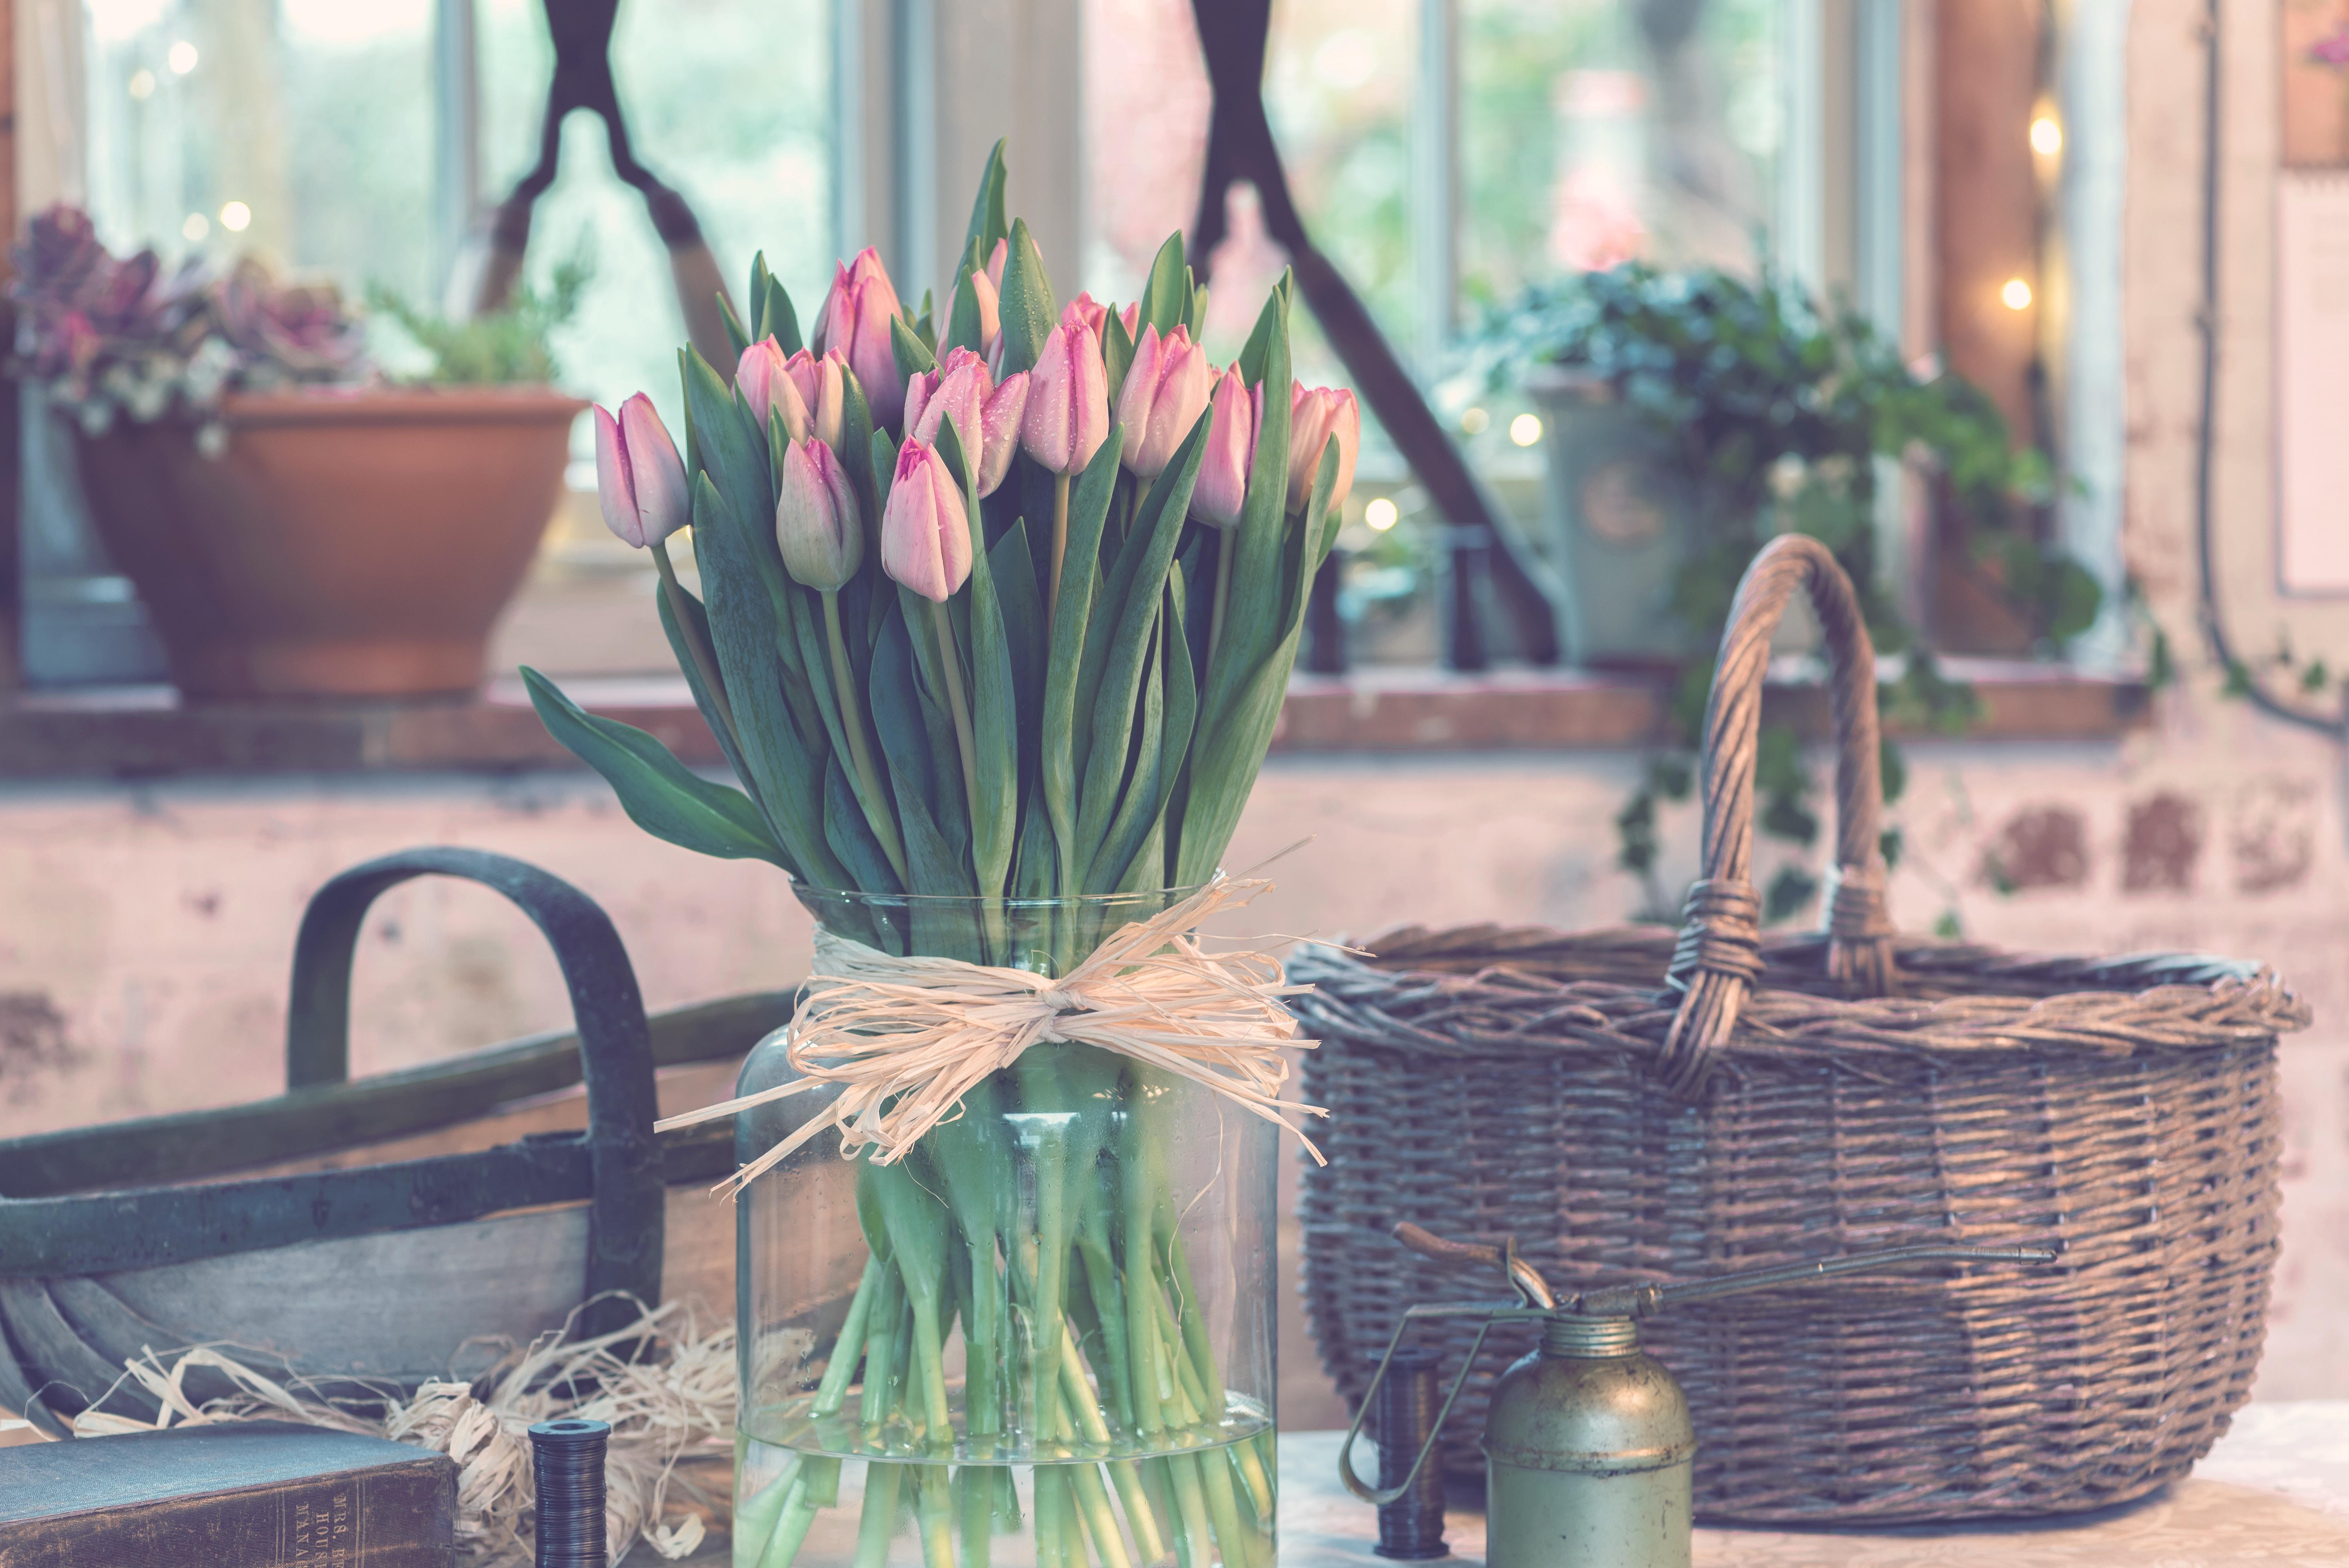 como mantener tulipanes frescos